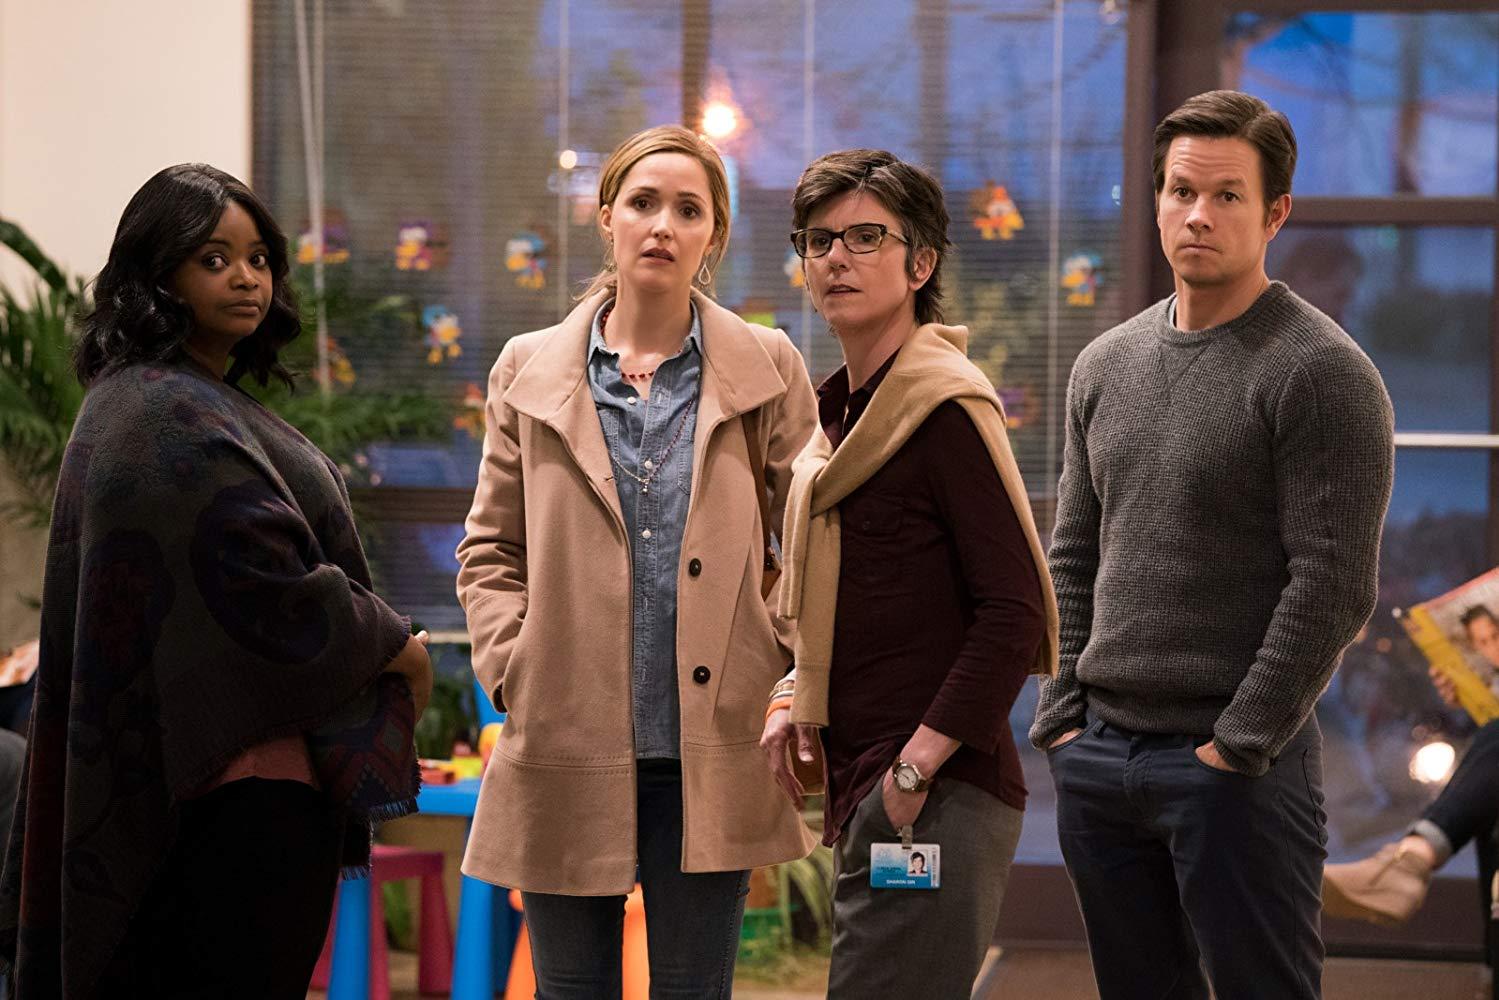 Instant Family: Mark Wahlberg, Rose Byrne, Tig Notaro, Octavia Spencer in una scena